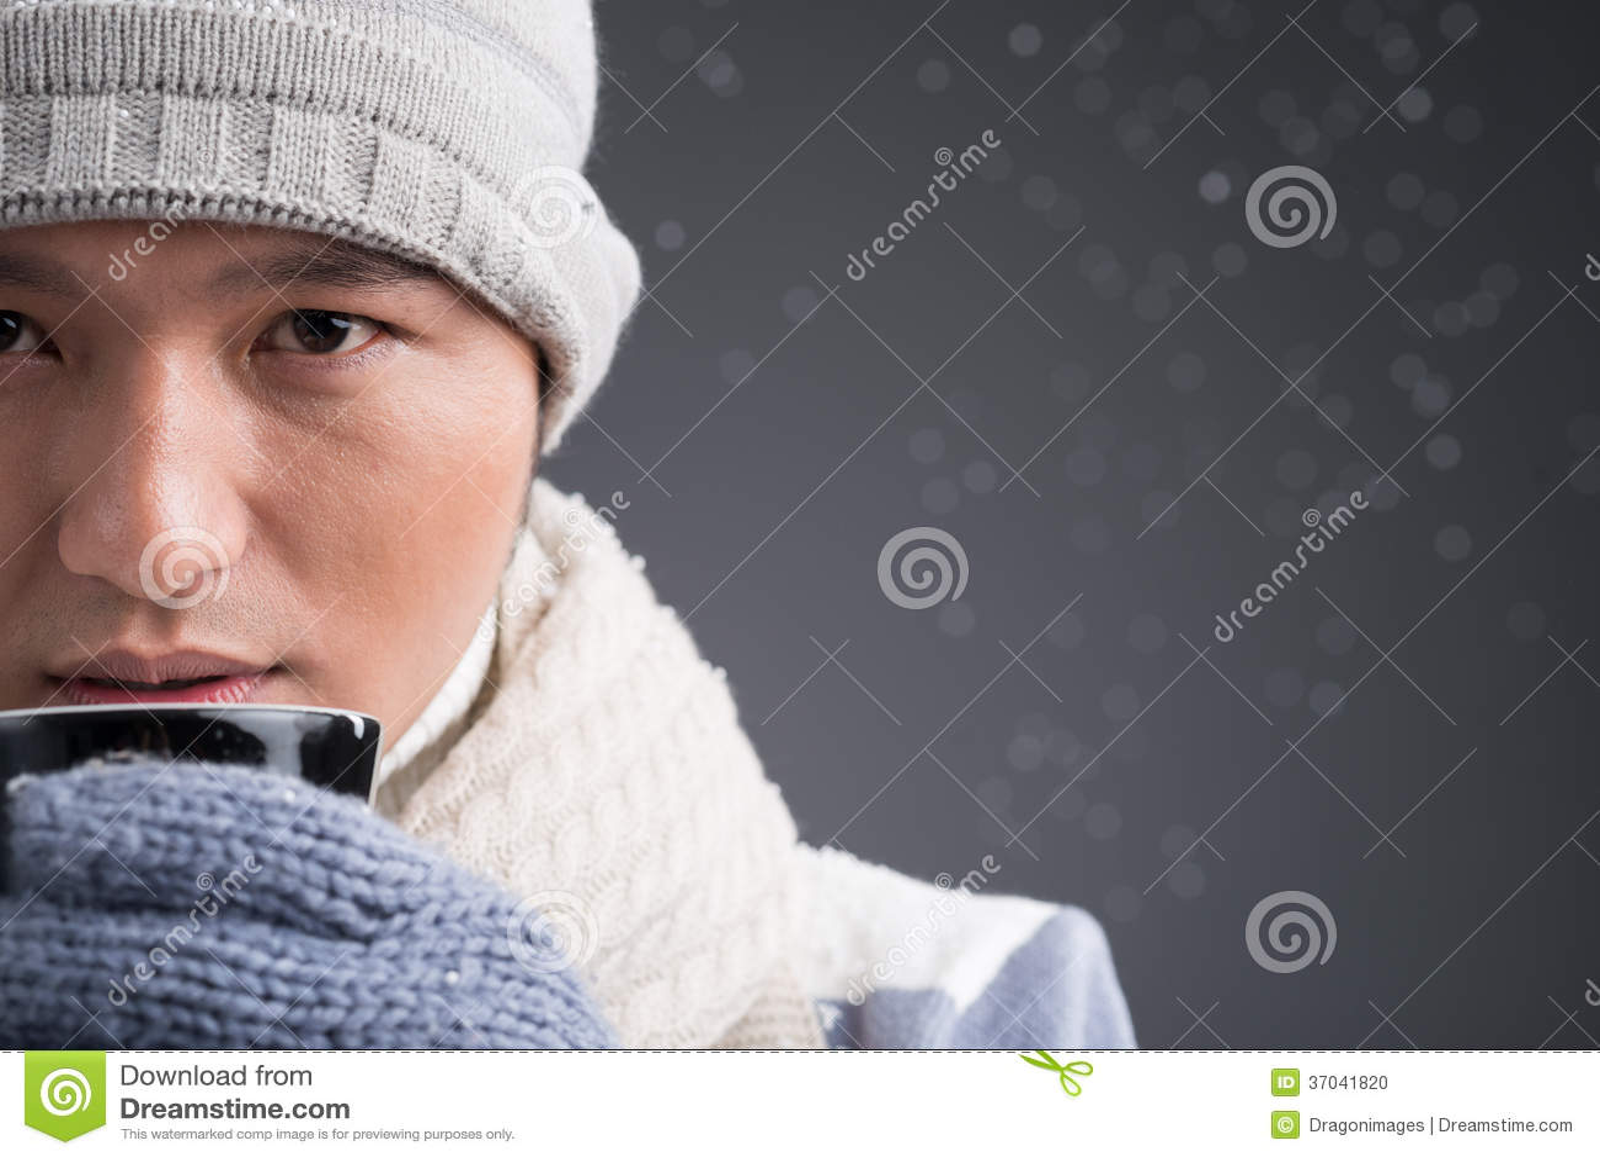 cold-weather-close-up-man-warm-hat-drinking-hot-beverage-37041820.jpg